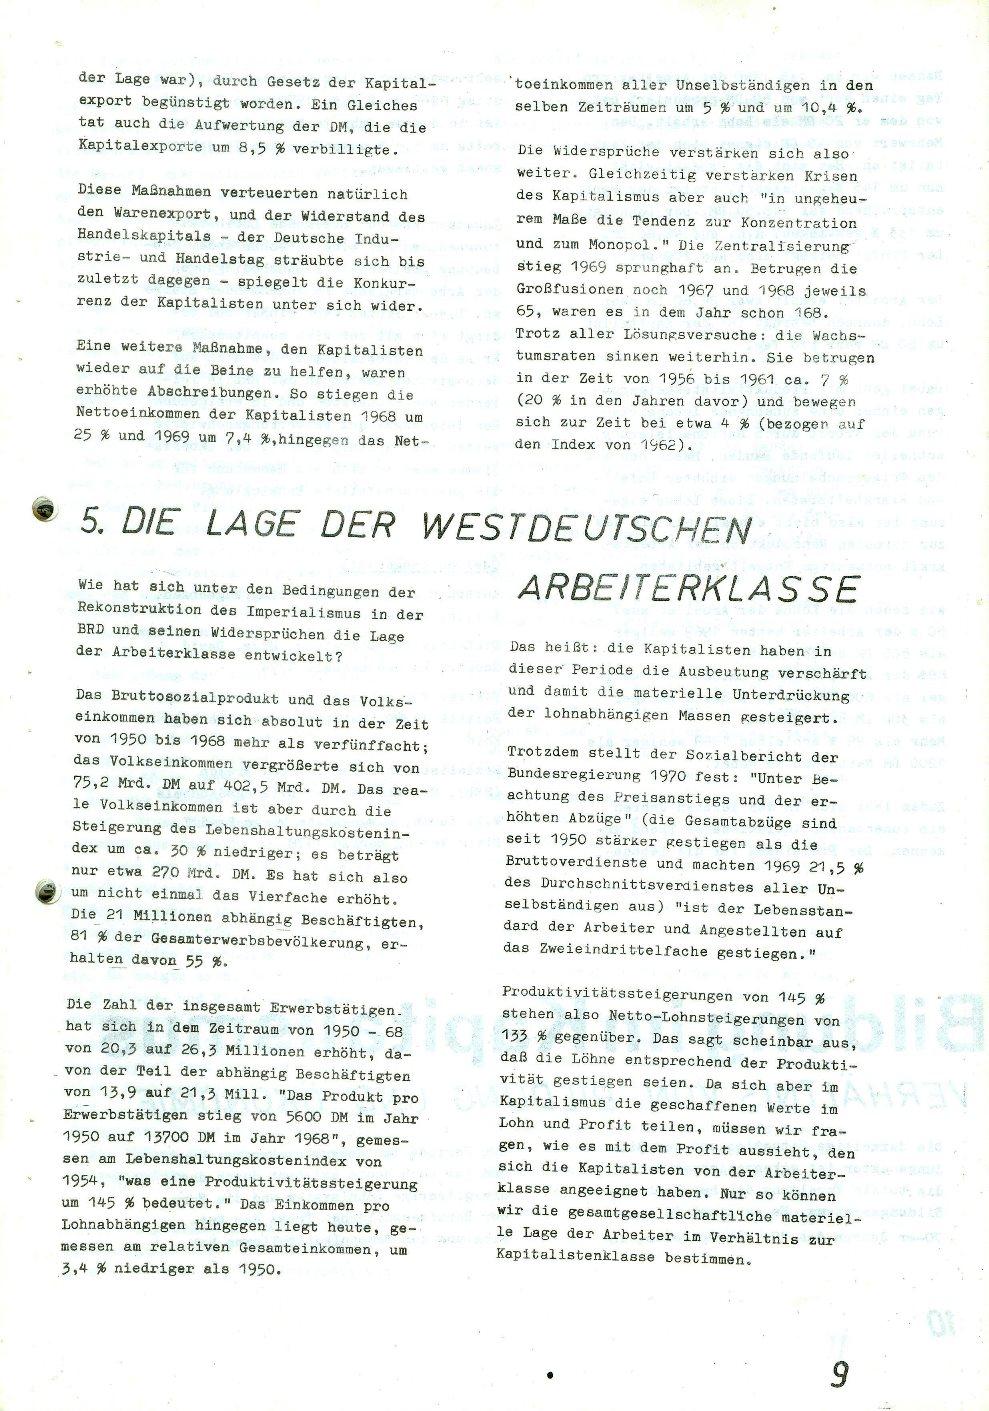 Oldenburg_KBW063